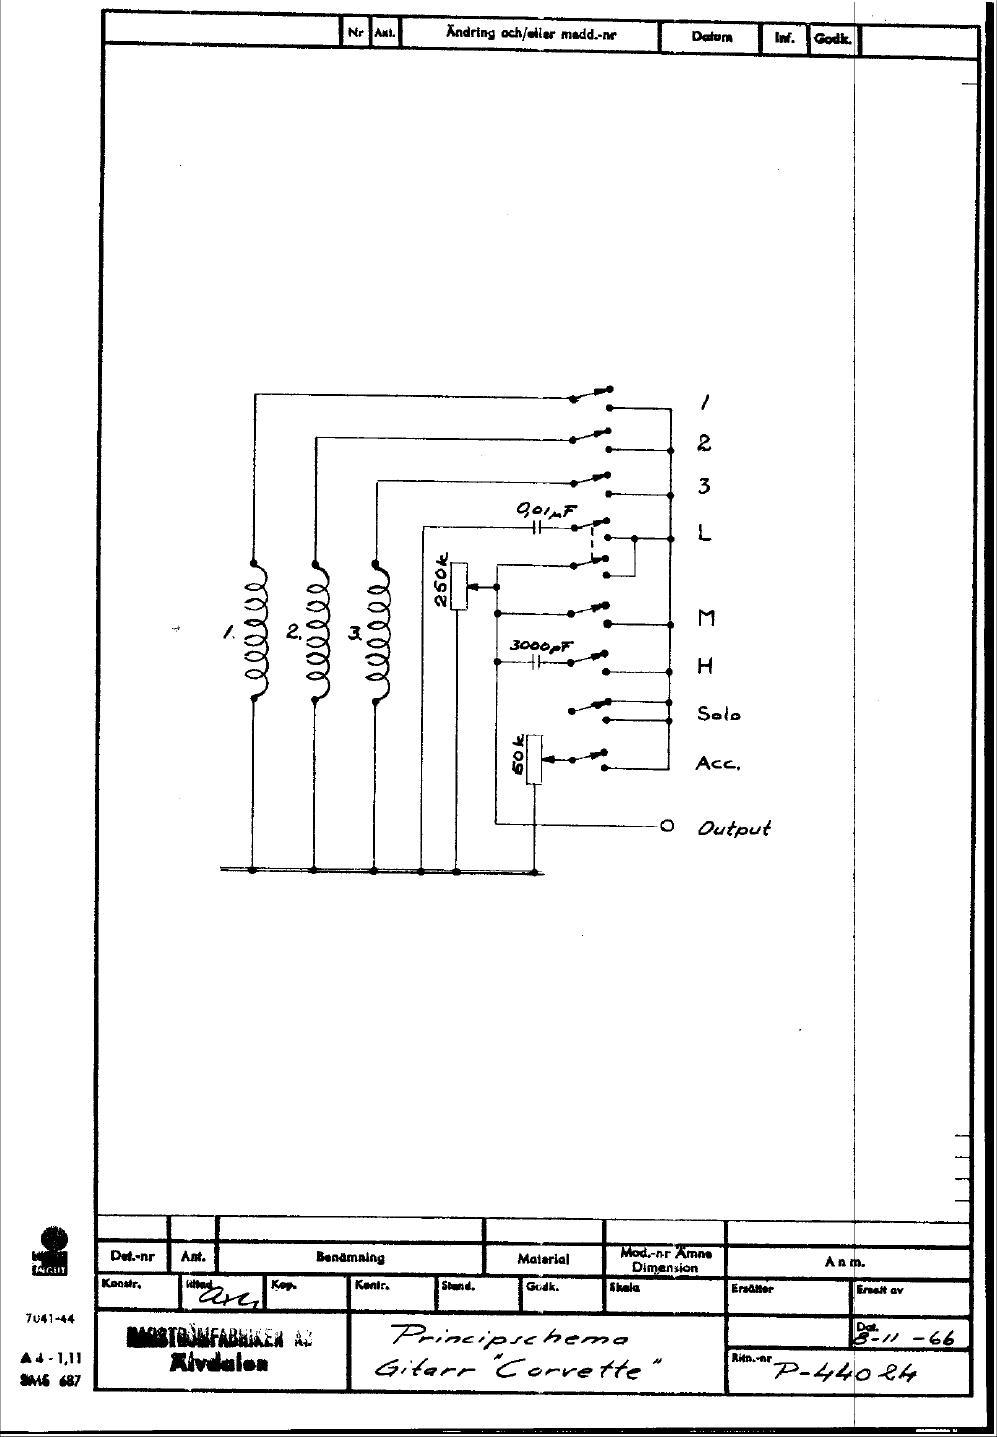 schemat /Przystawki2/Hagstrom Corvette-1966.jpg